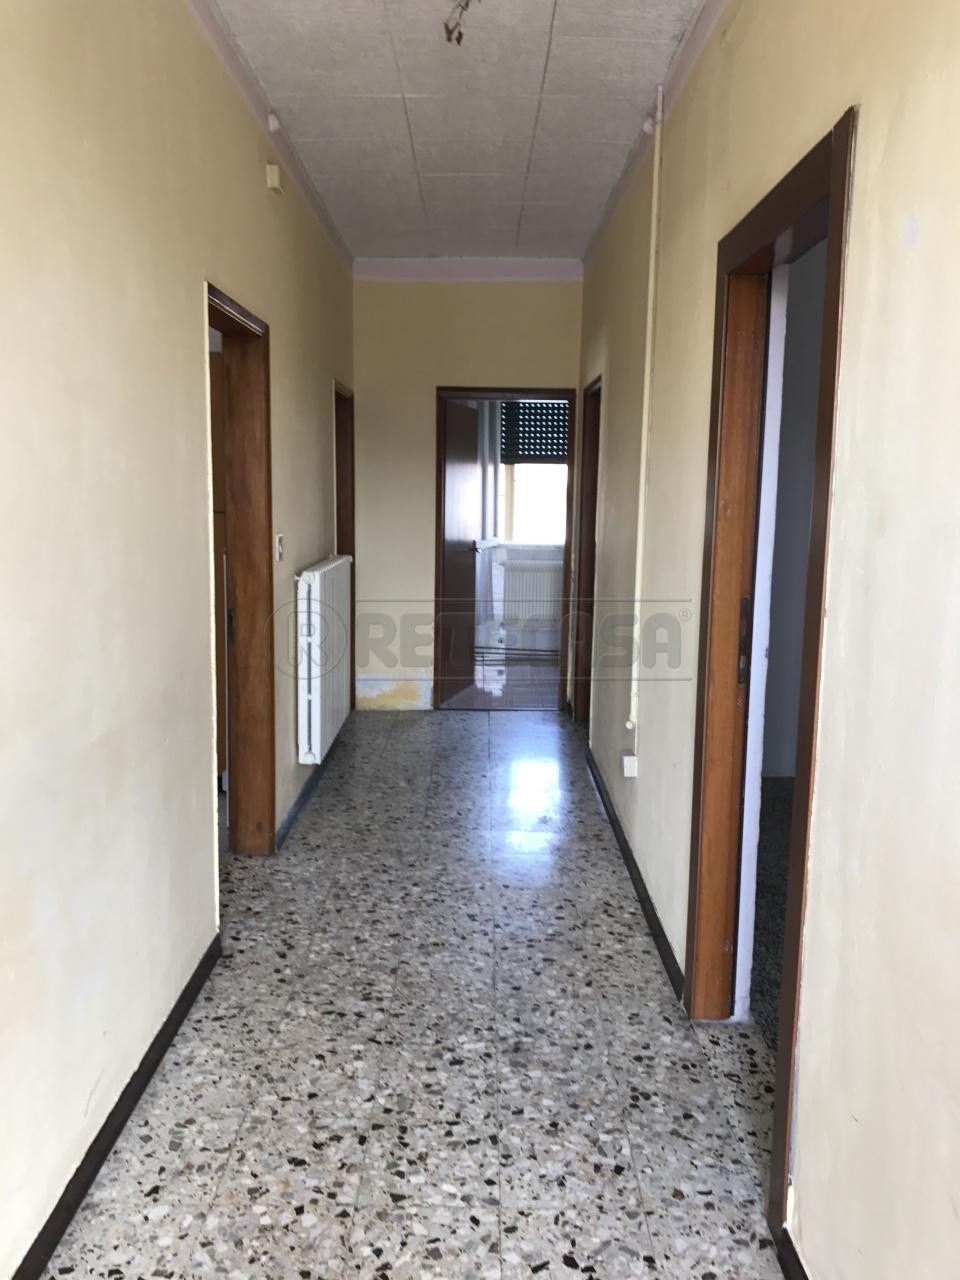 Appartamento in vendita a San Donà di Piave, 8 locali, Trattative riservate | Cambio Casa.it